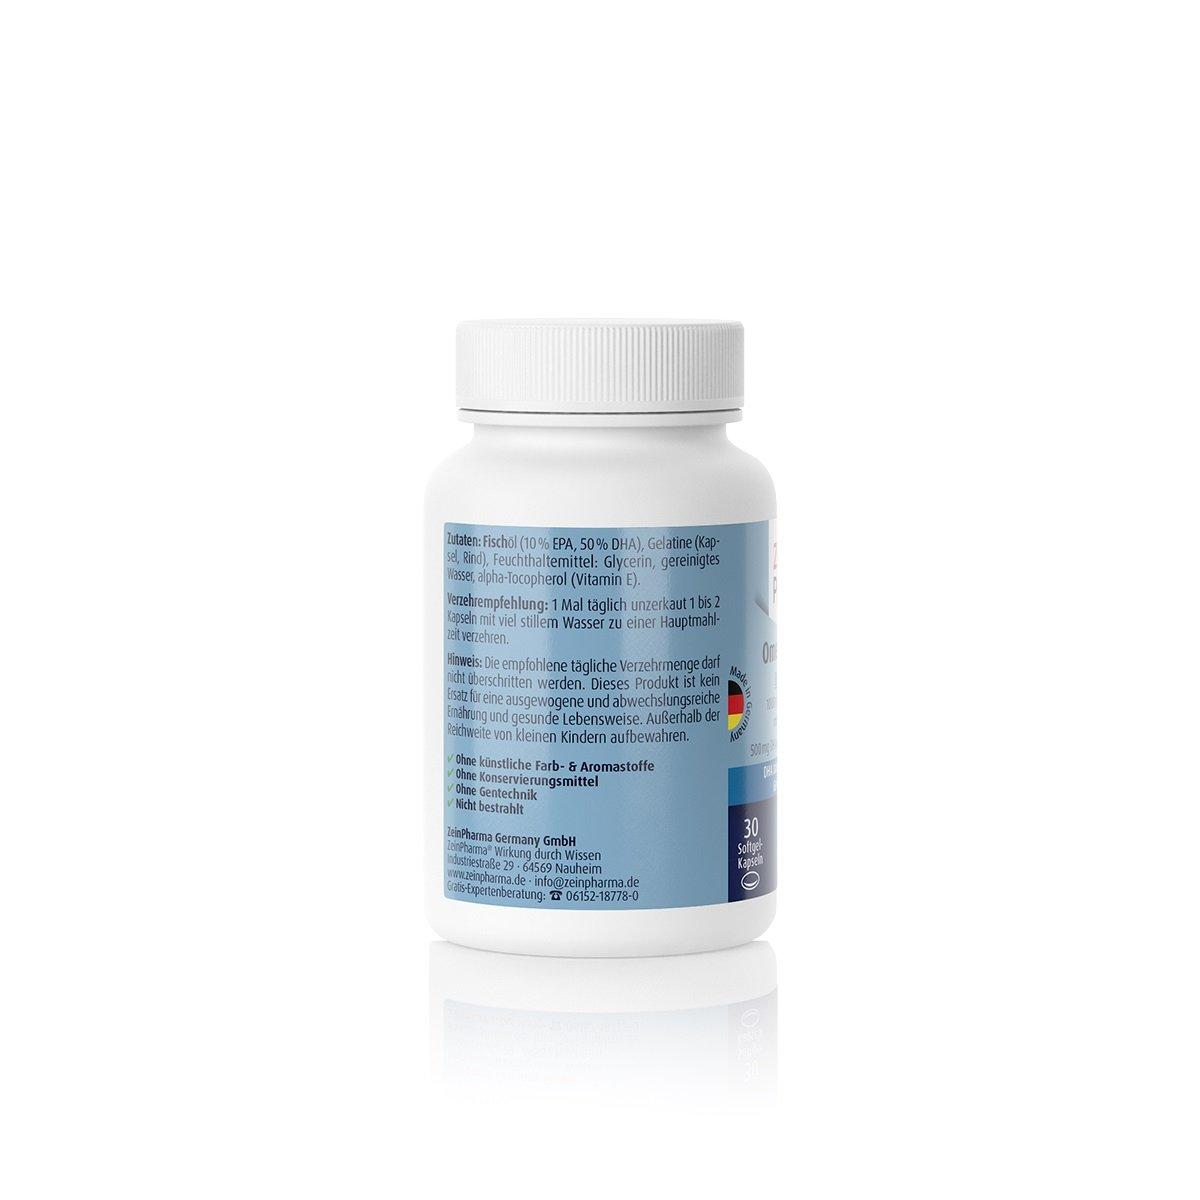 Omega-3 Gold - Brain Edition - 30 Kapseln